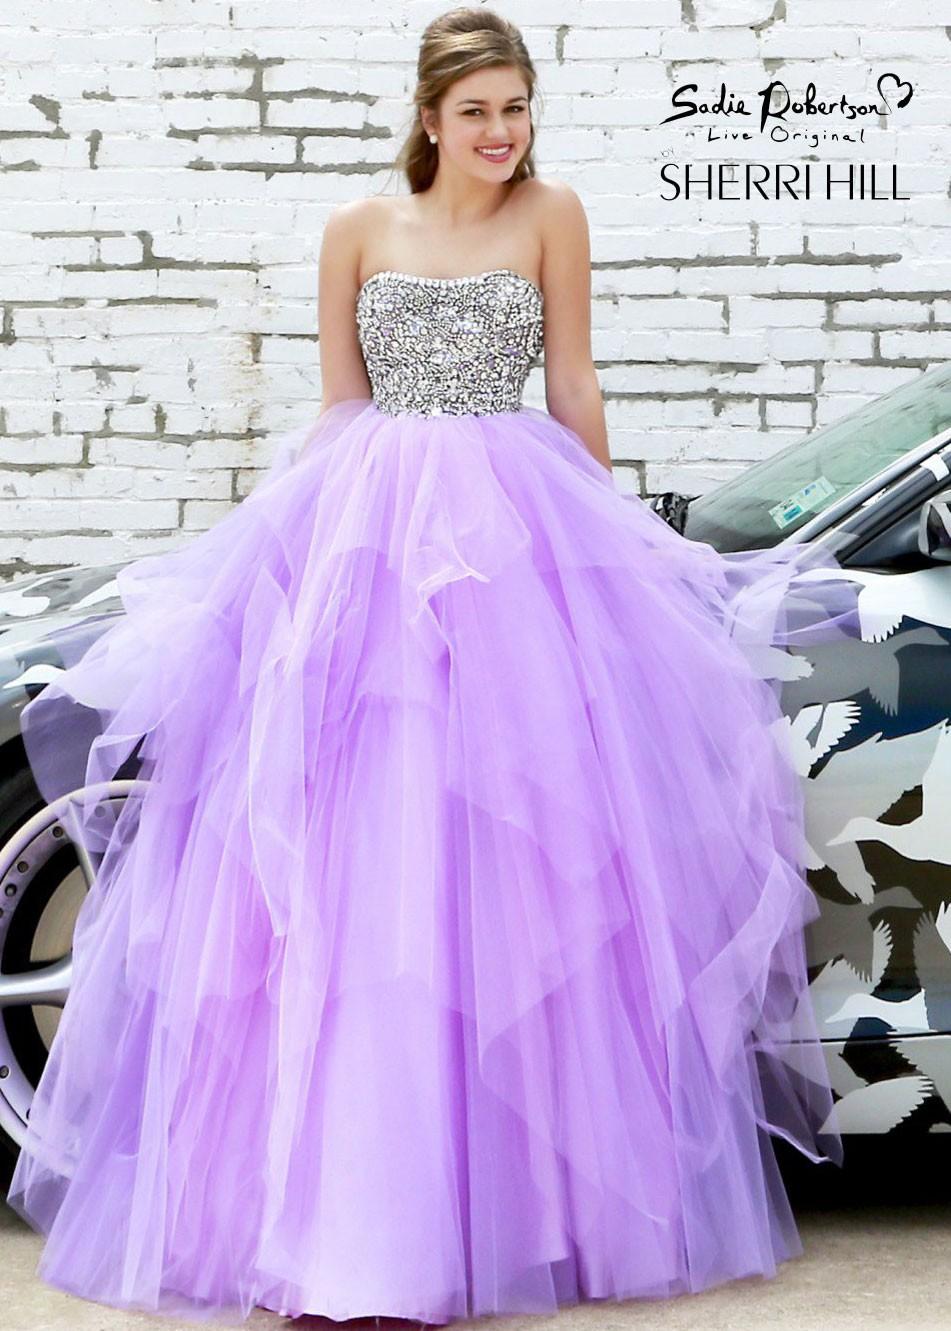 Sadie robertson purple dress